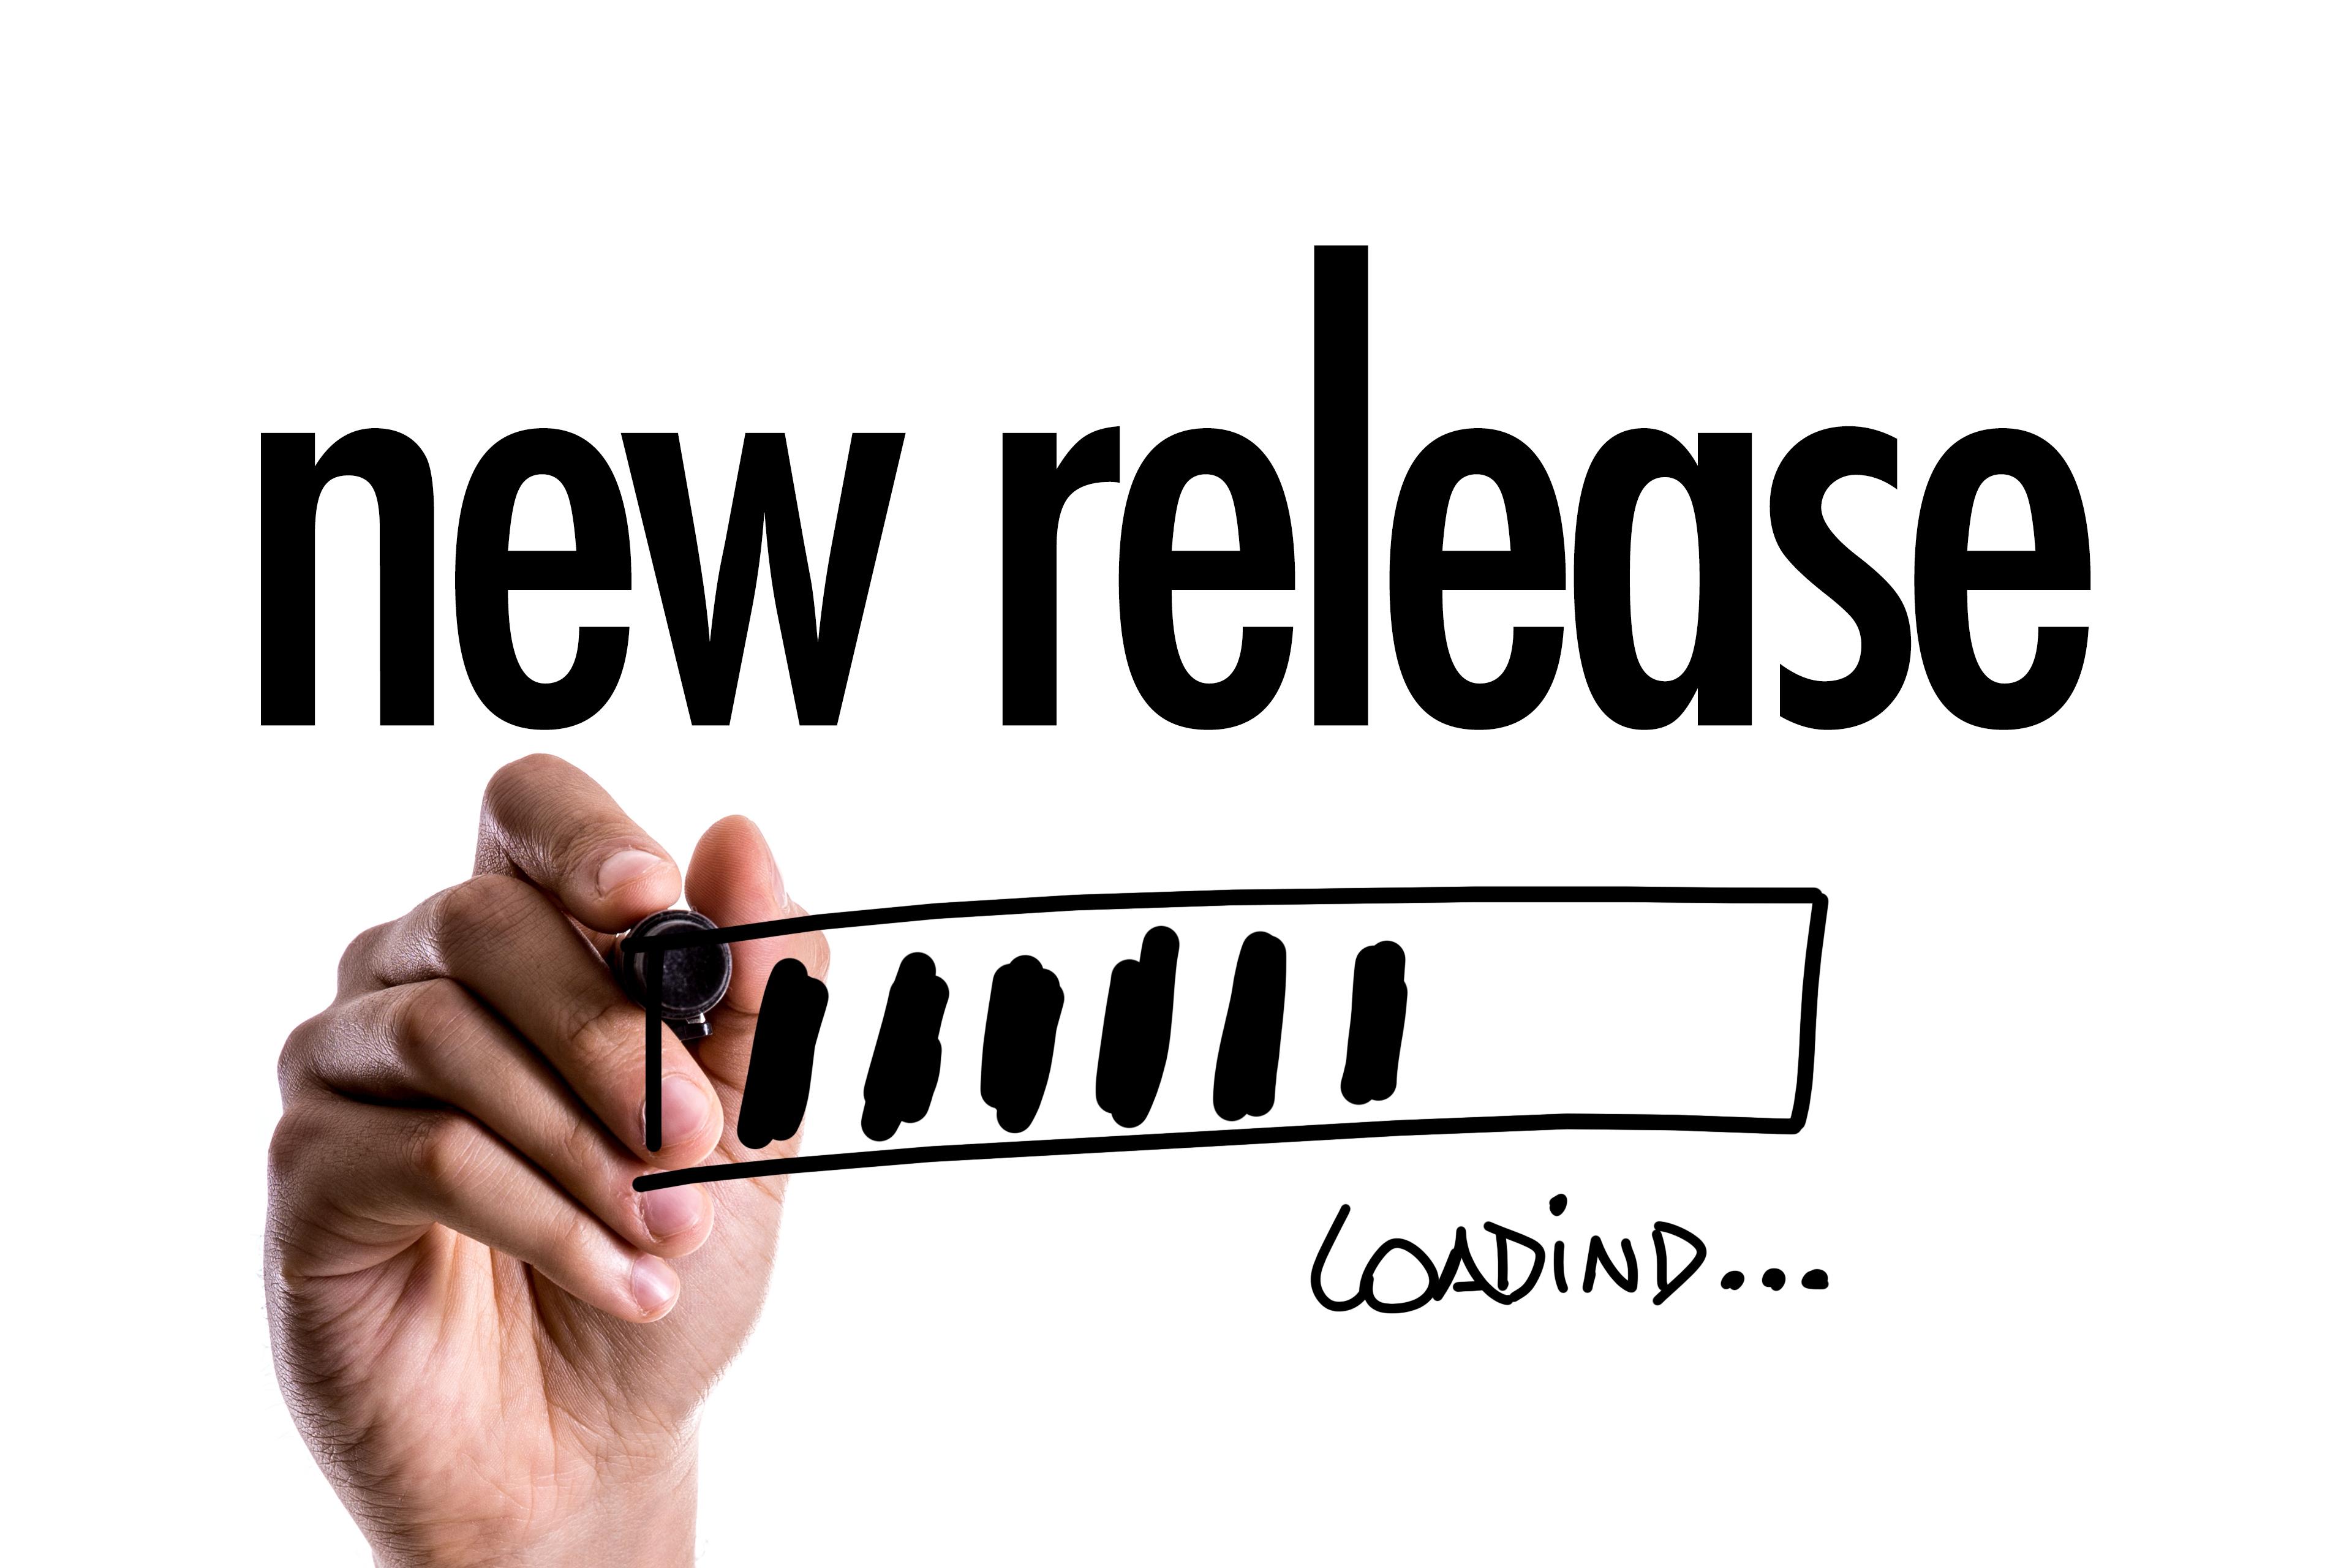 Nodejs Foundation Readies Official Developer Certification